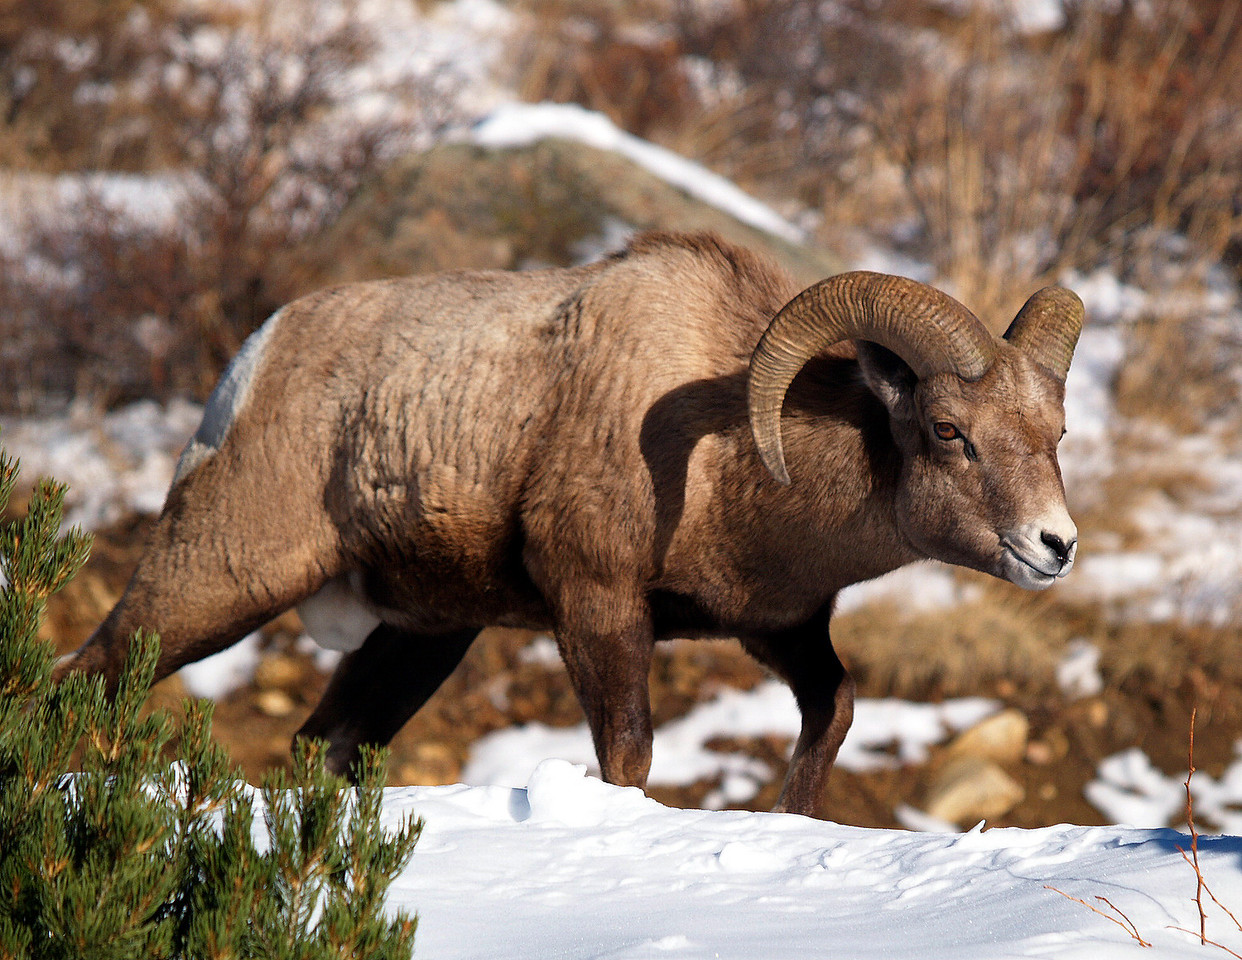 Bighorn Sheep Ram - on the prowl